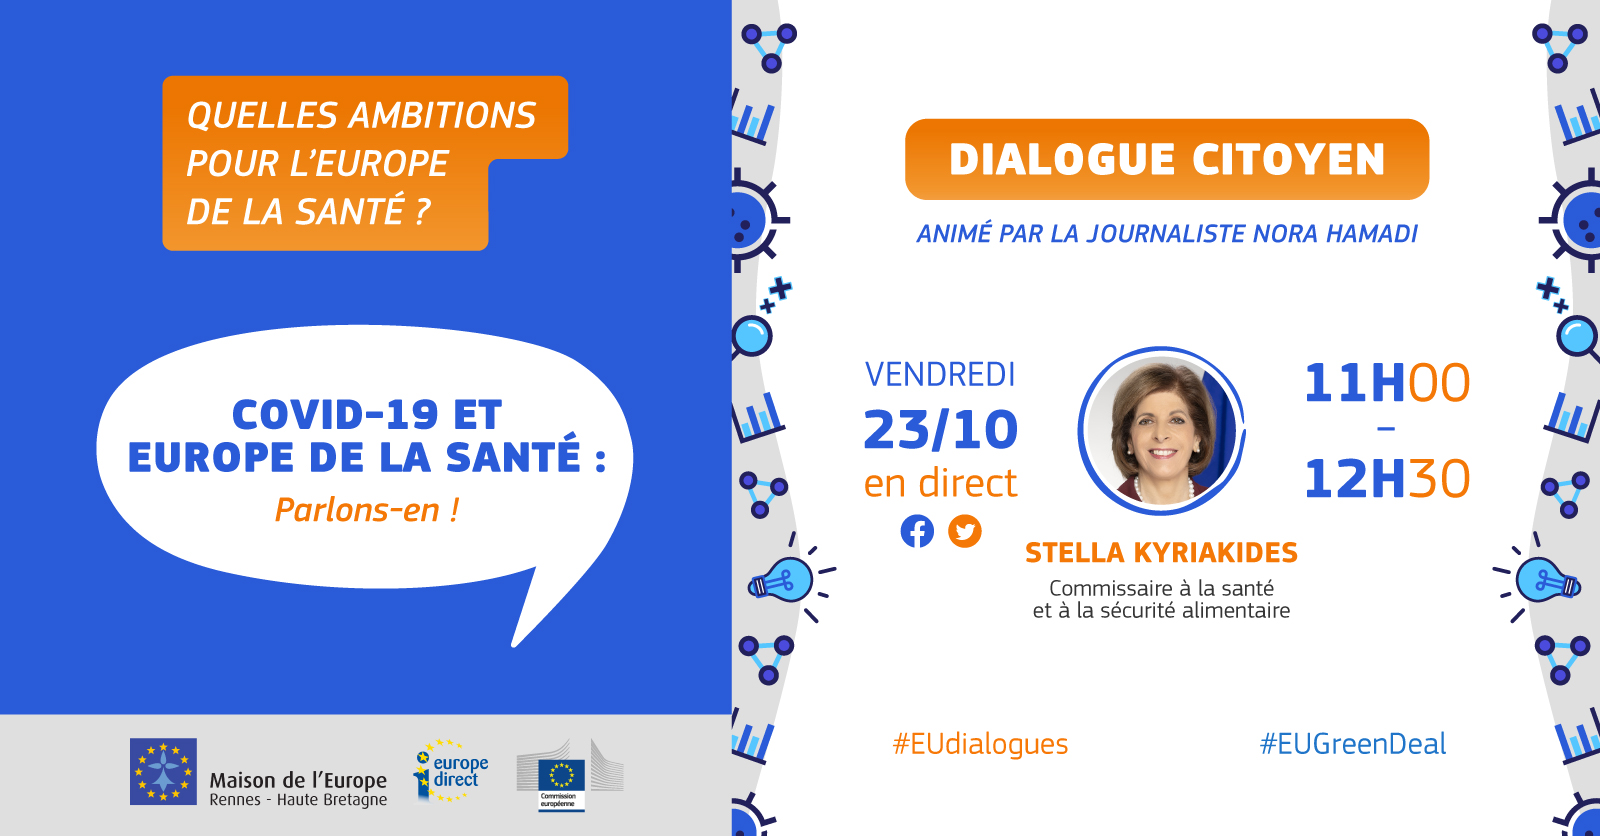 Visuel Twitter Dialogue Citoyen Kyriakides 2